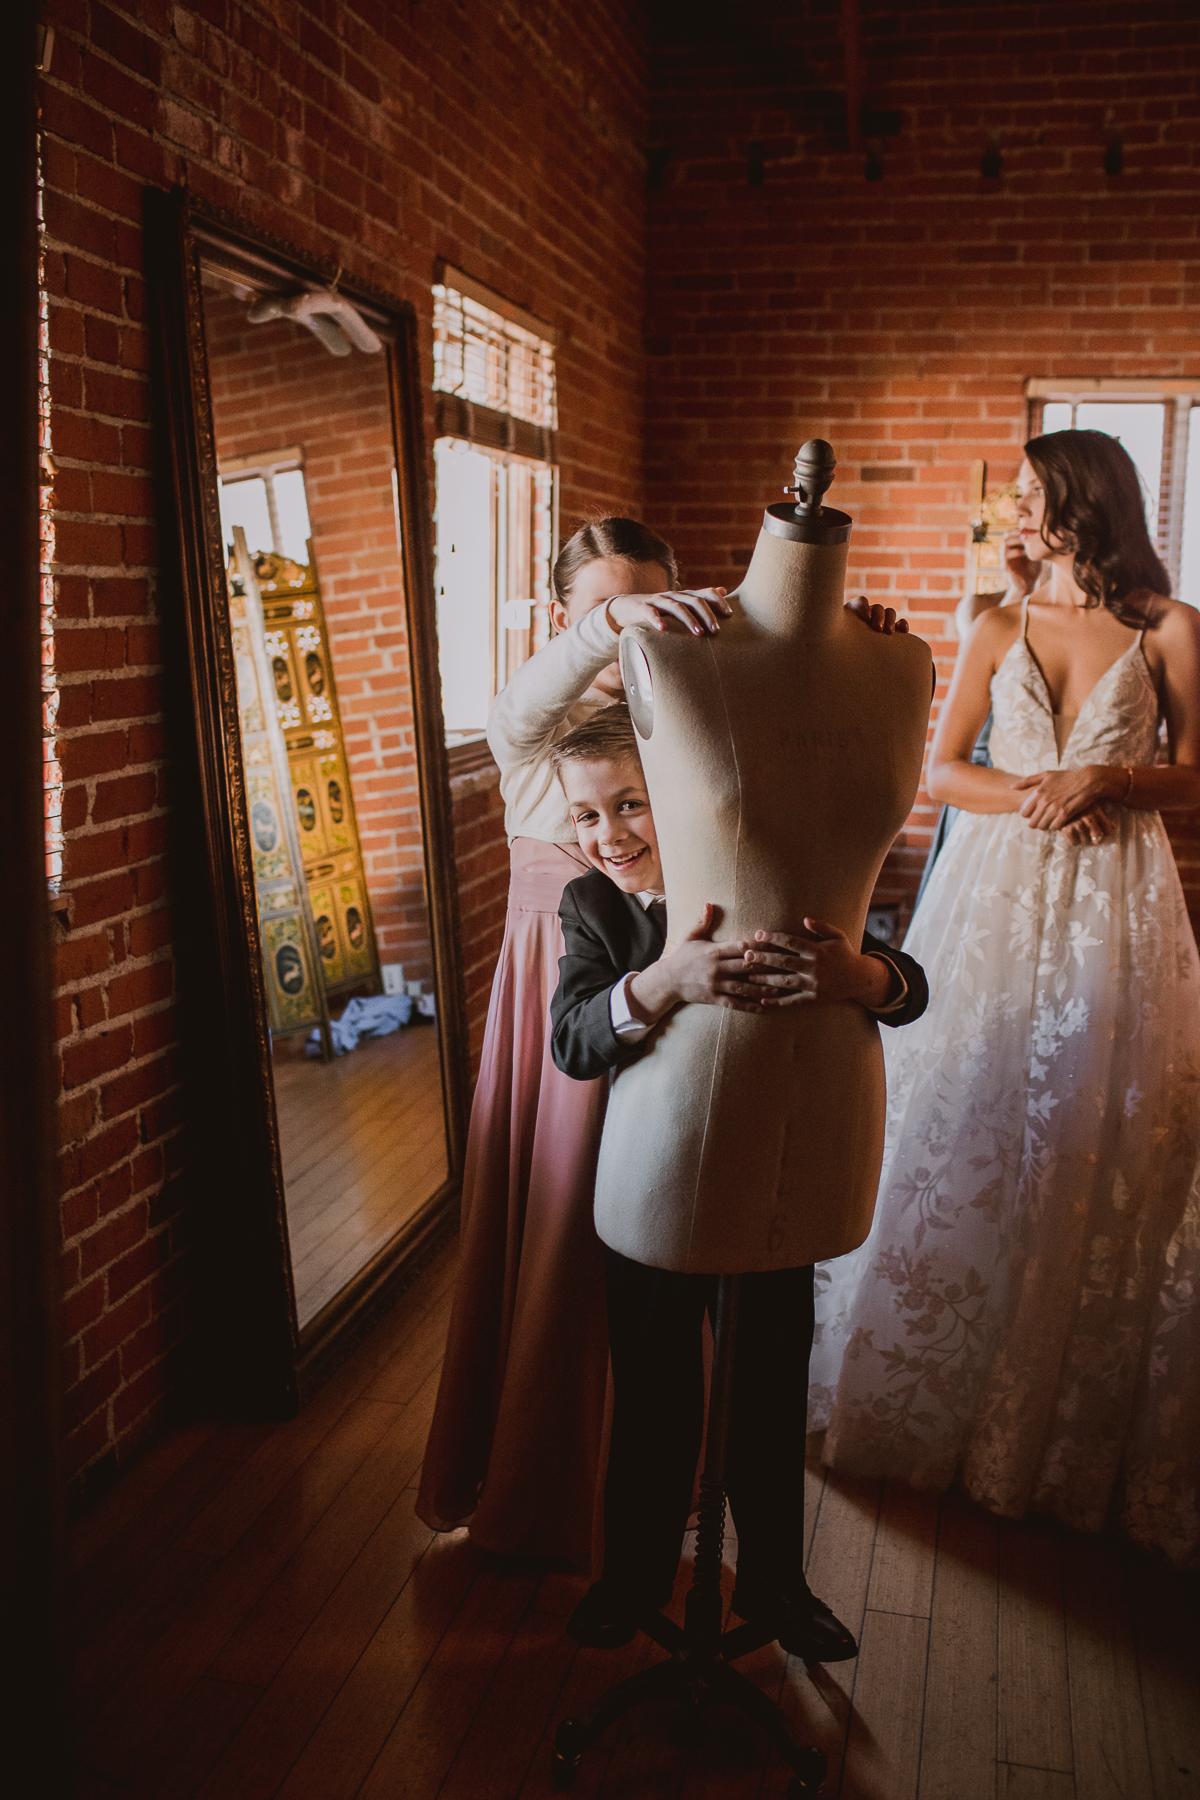 carondelet-house-kelley-raye-los-angeles-wedding-photographer-18.jpg